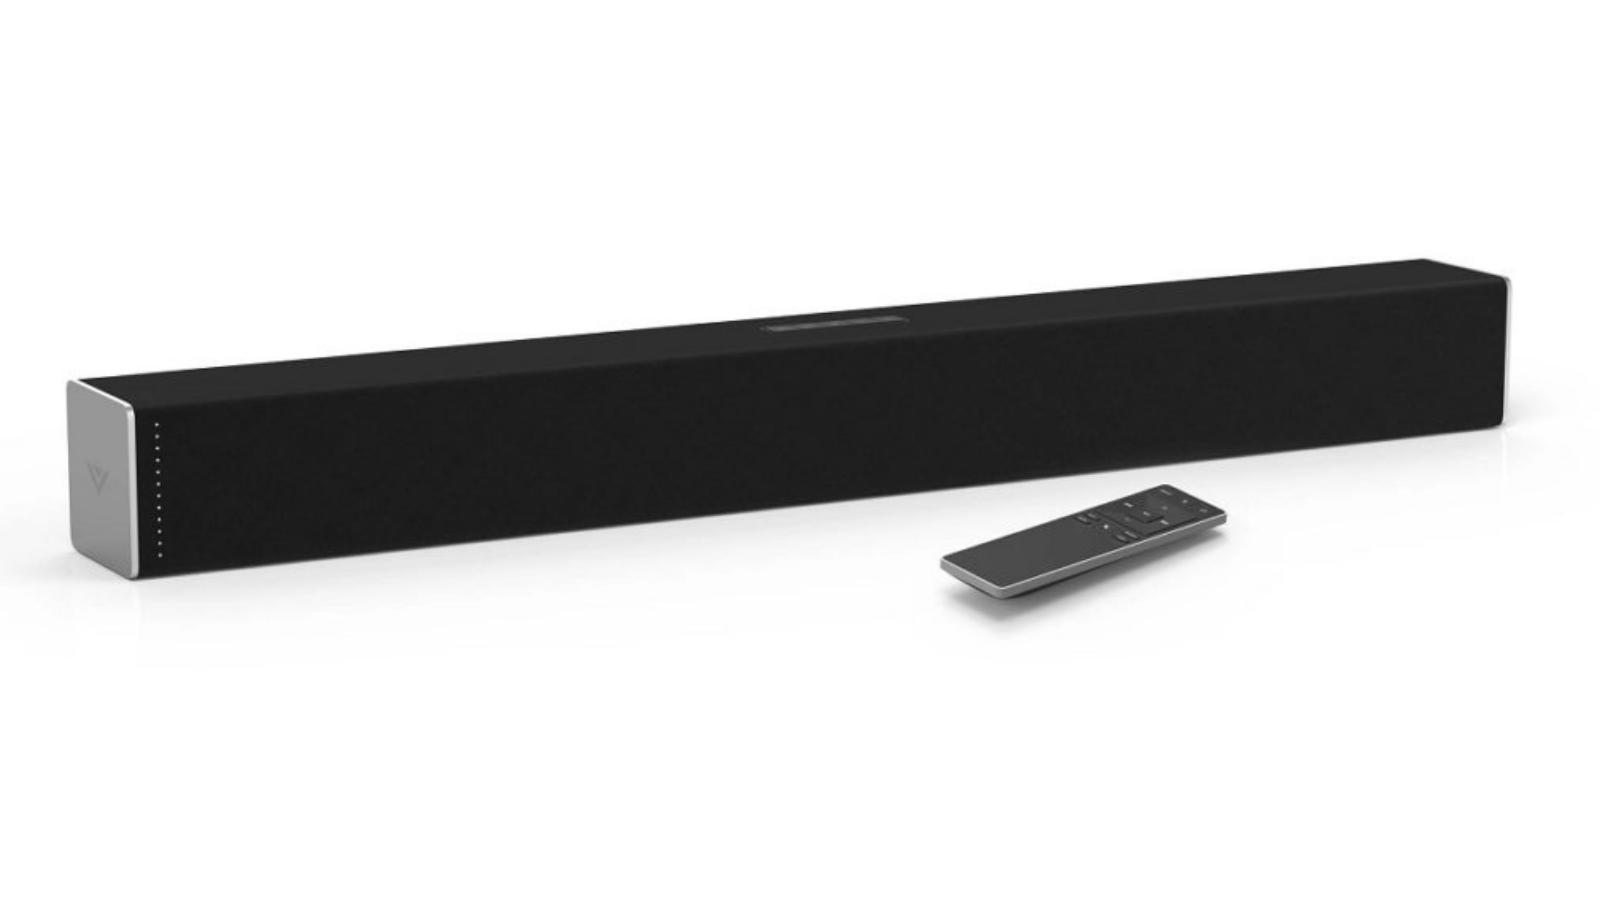 Best soundbars for gaming visio deal